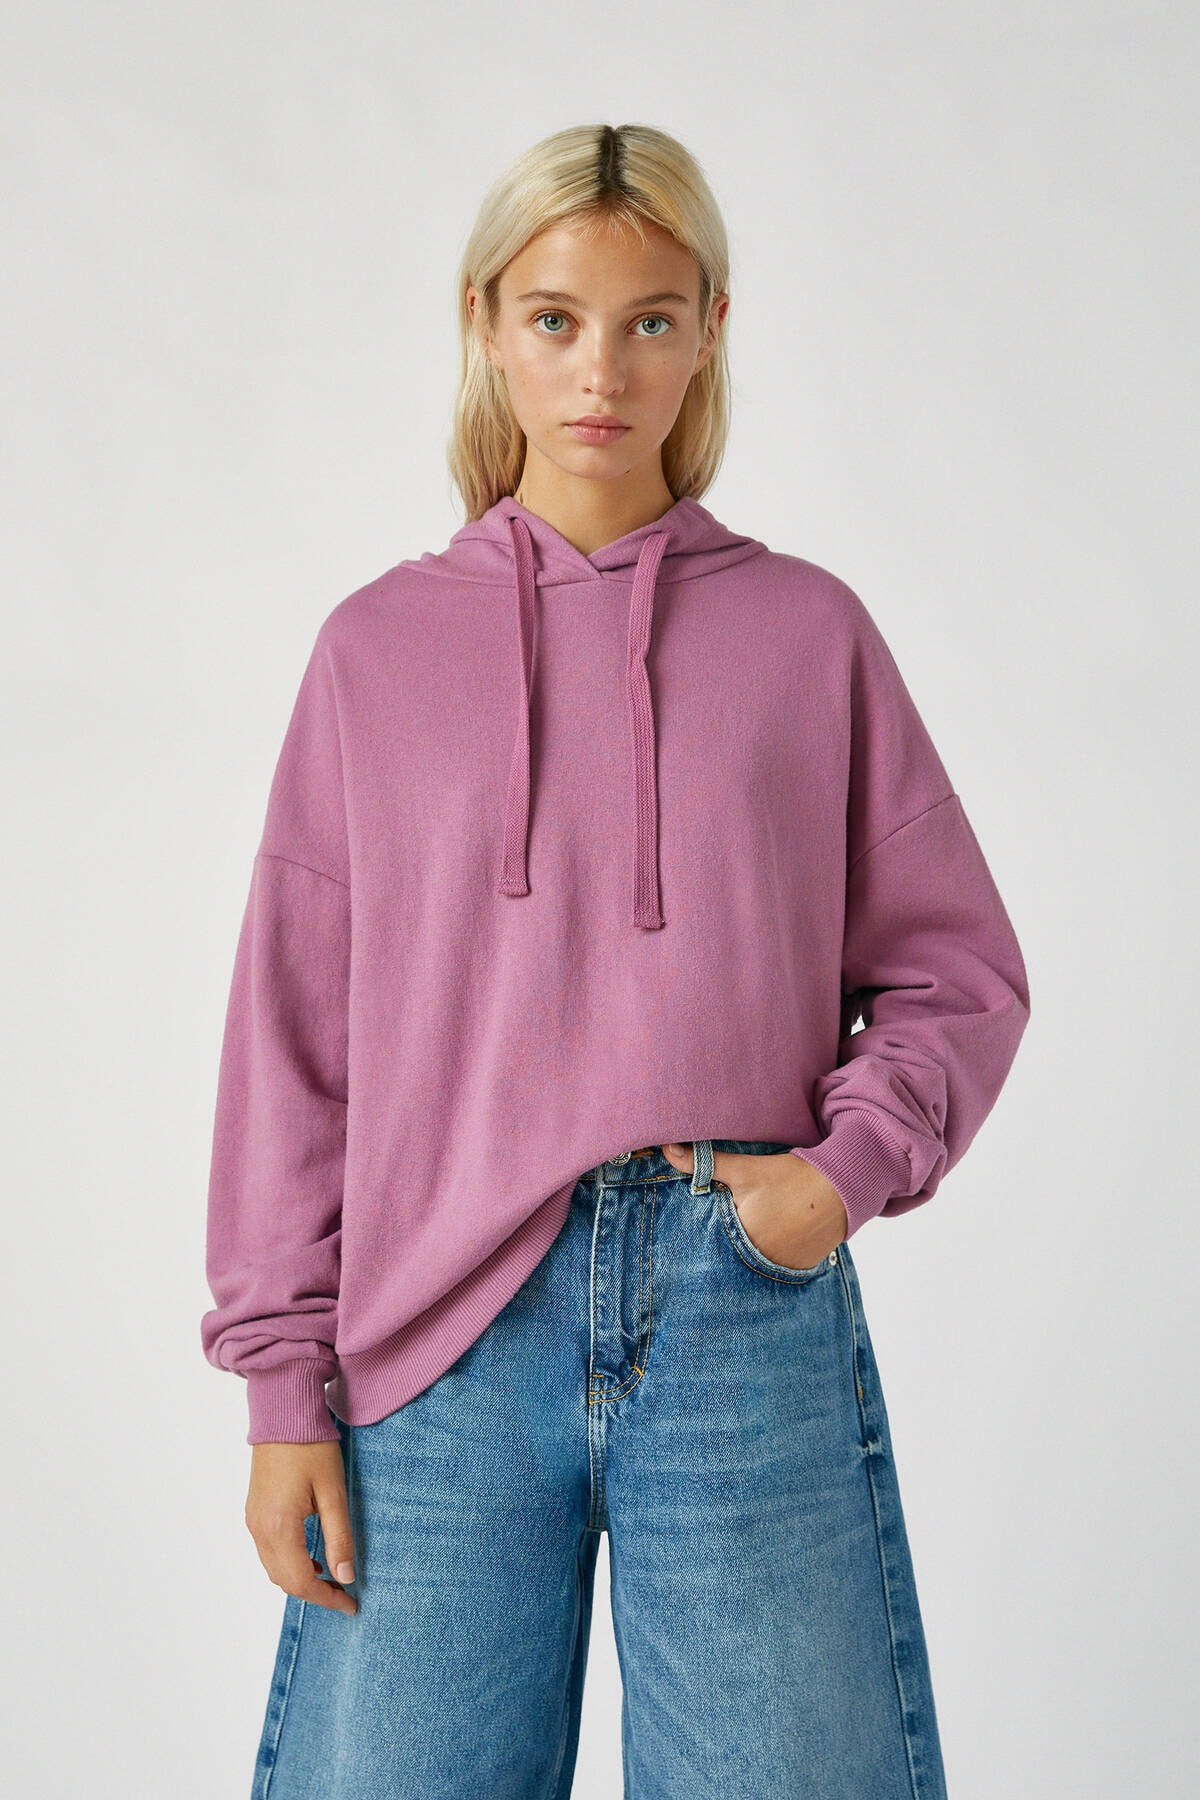 Pull & Bear Kadın Mor Renkli Kapüşonlu Sweatshirt 09594312 0